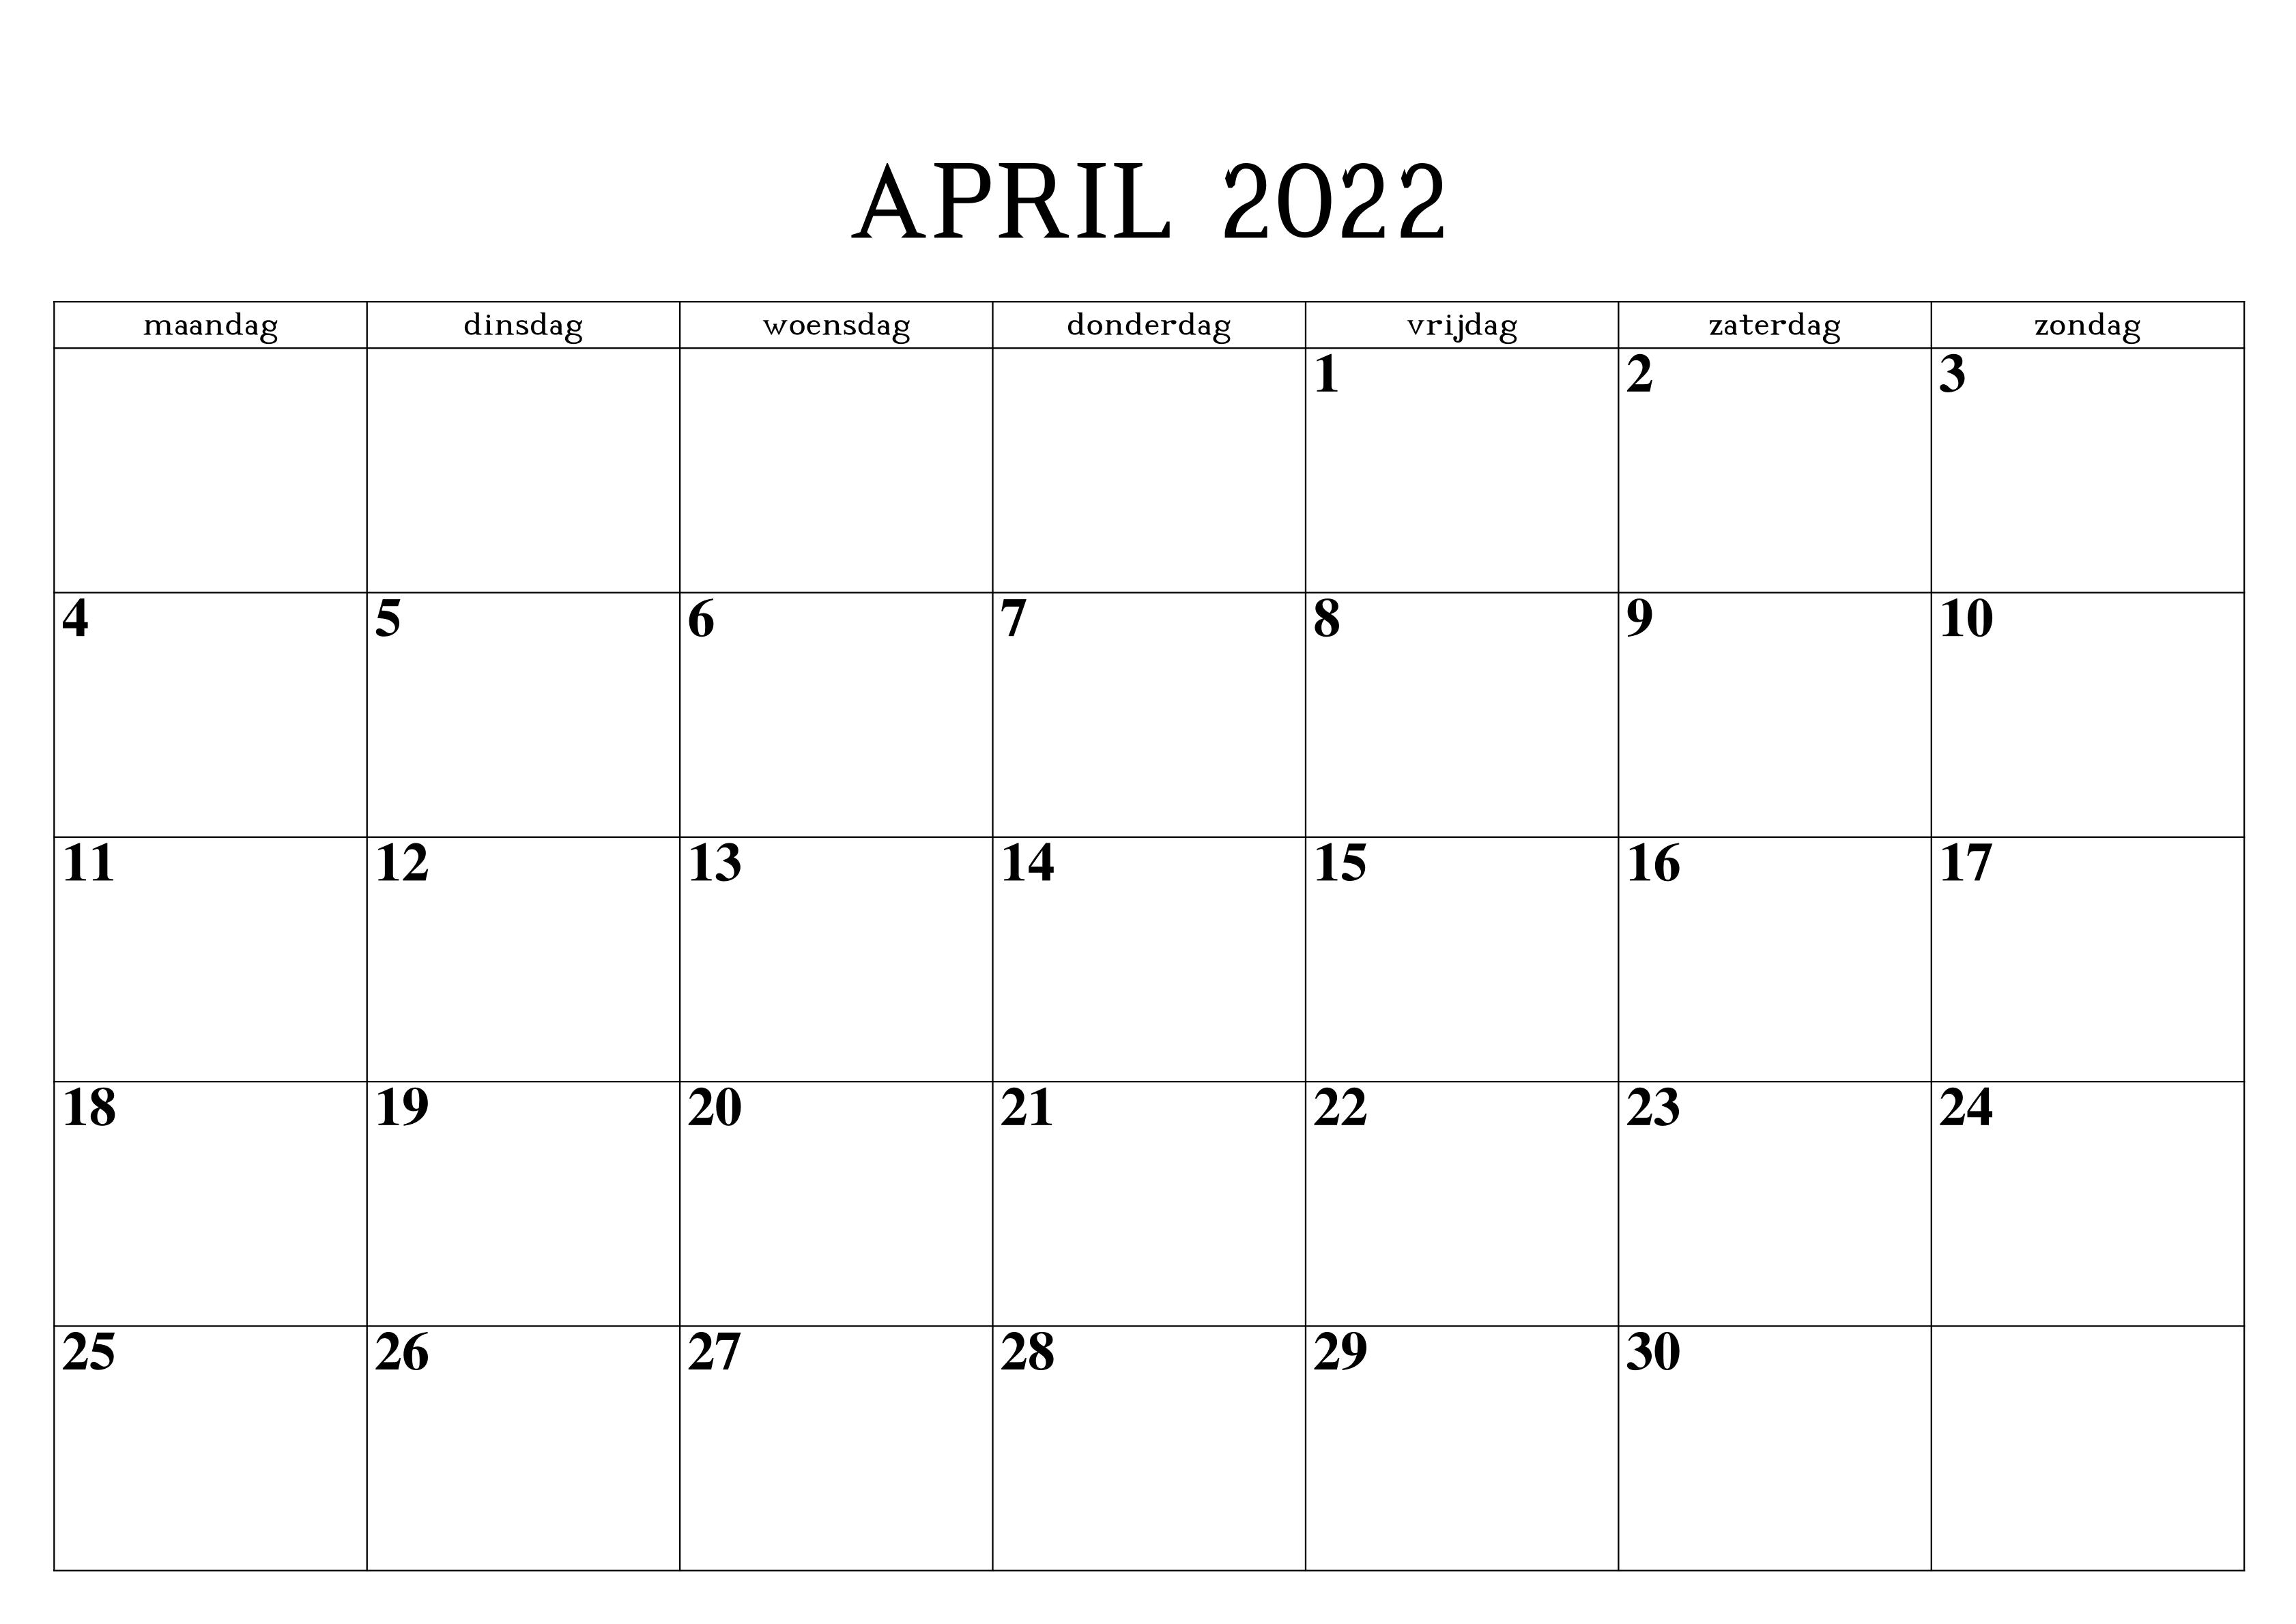 Frei April 2022 Kalender Ausdrucken